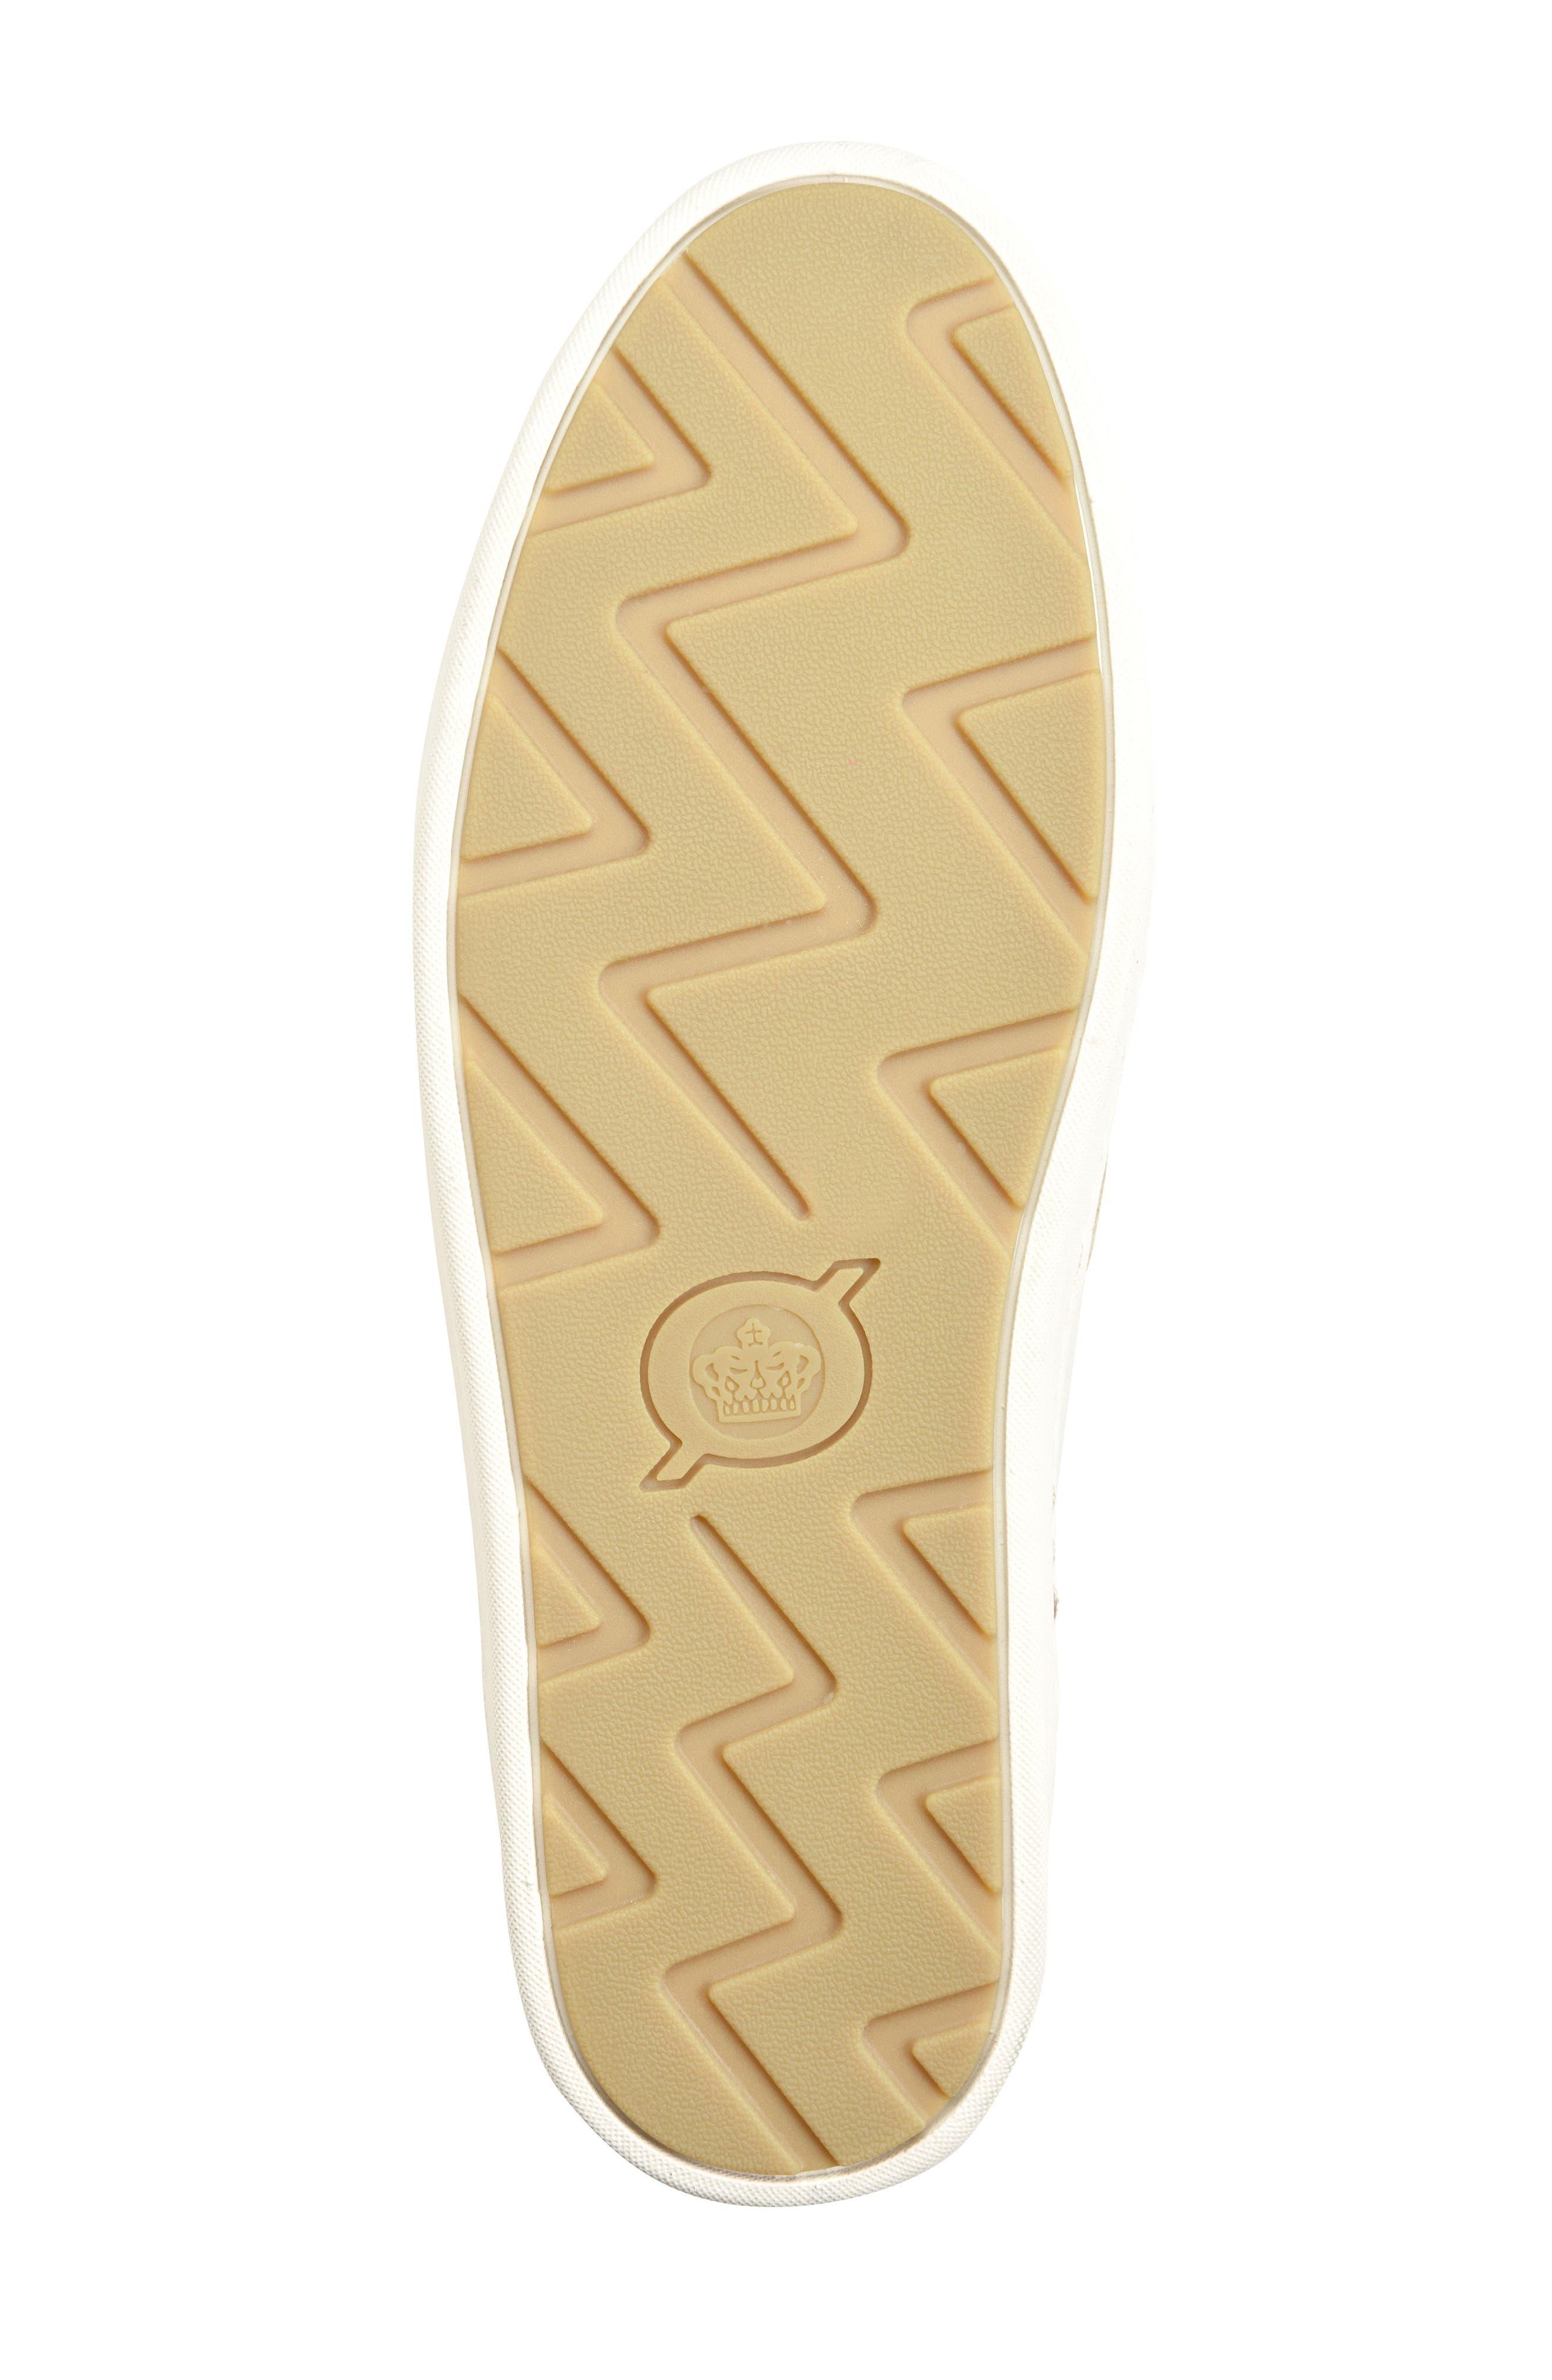 Keystone Low Top Sneaker,                             Alternate thumbnail 18, color,